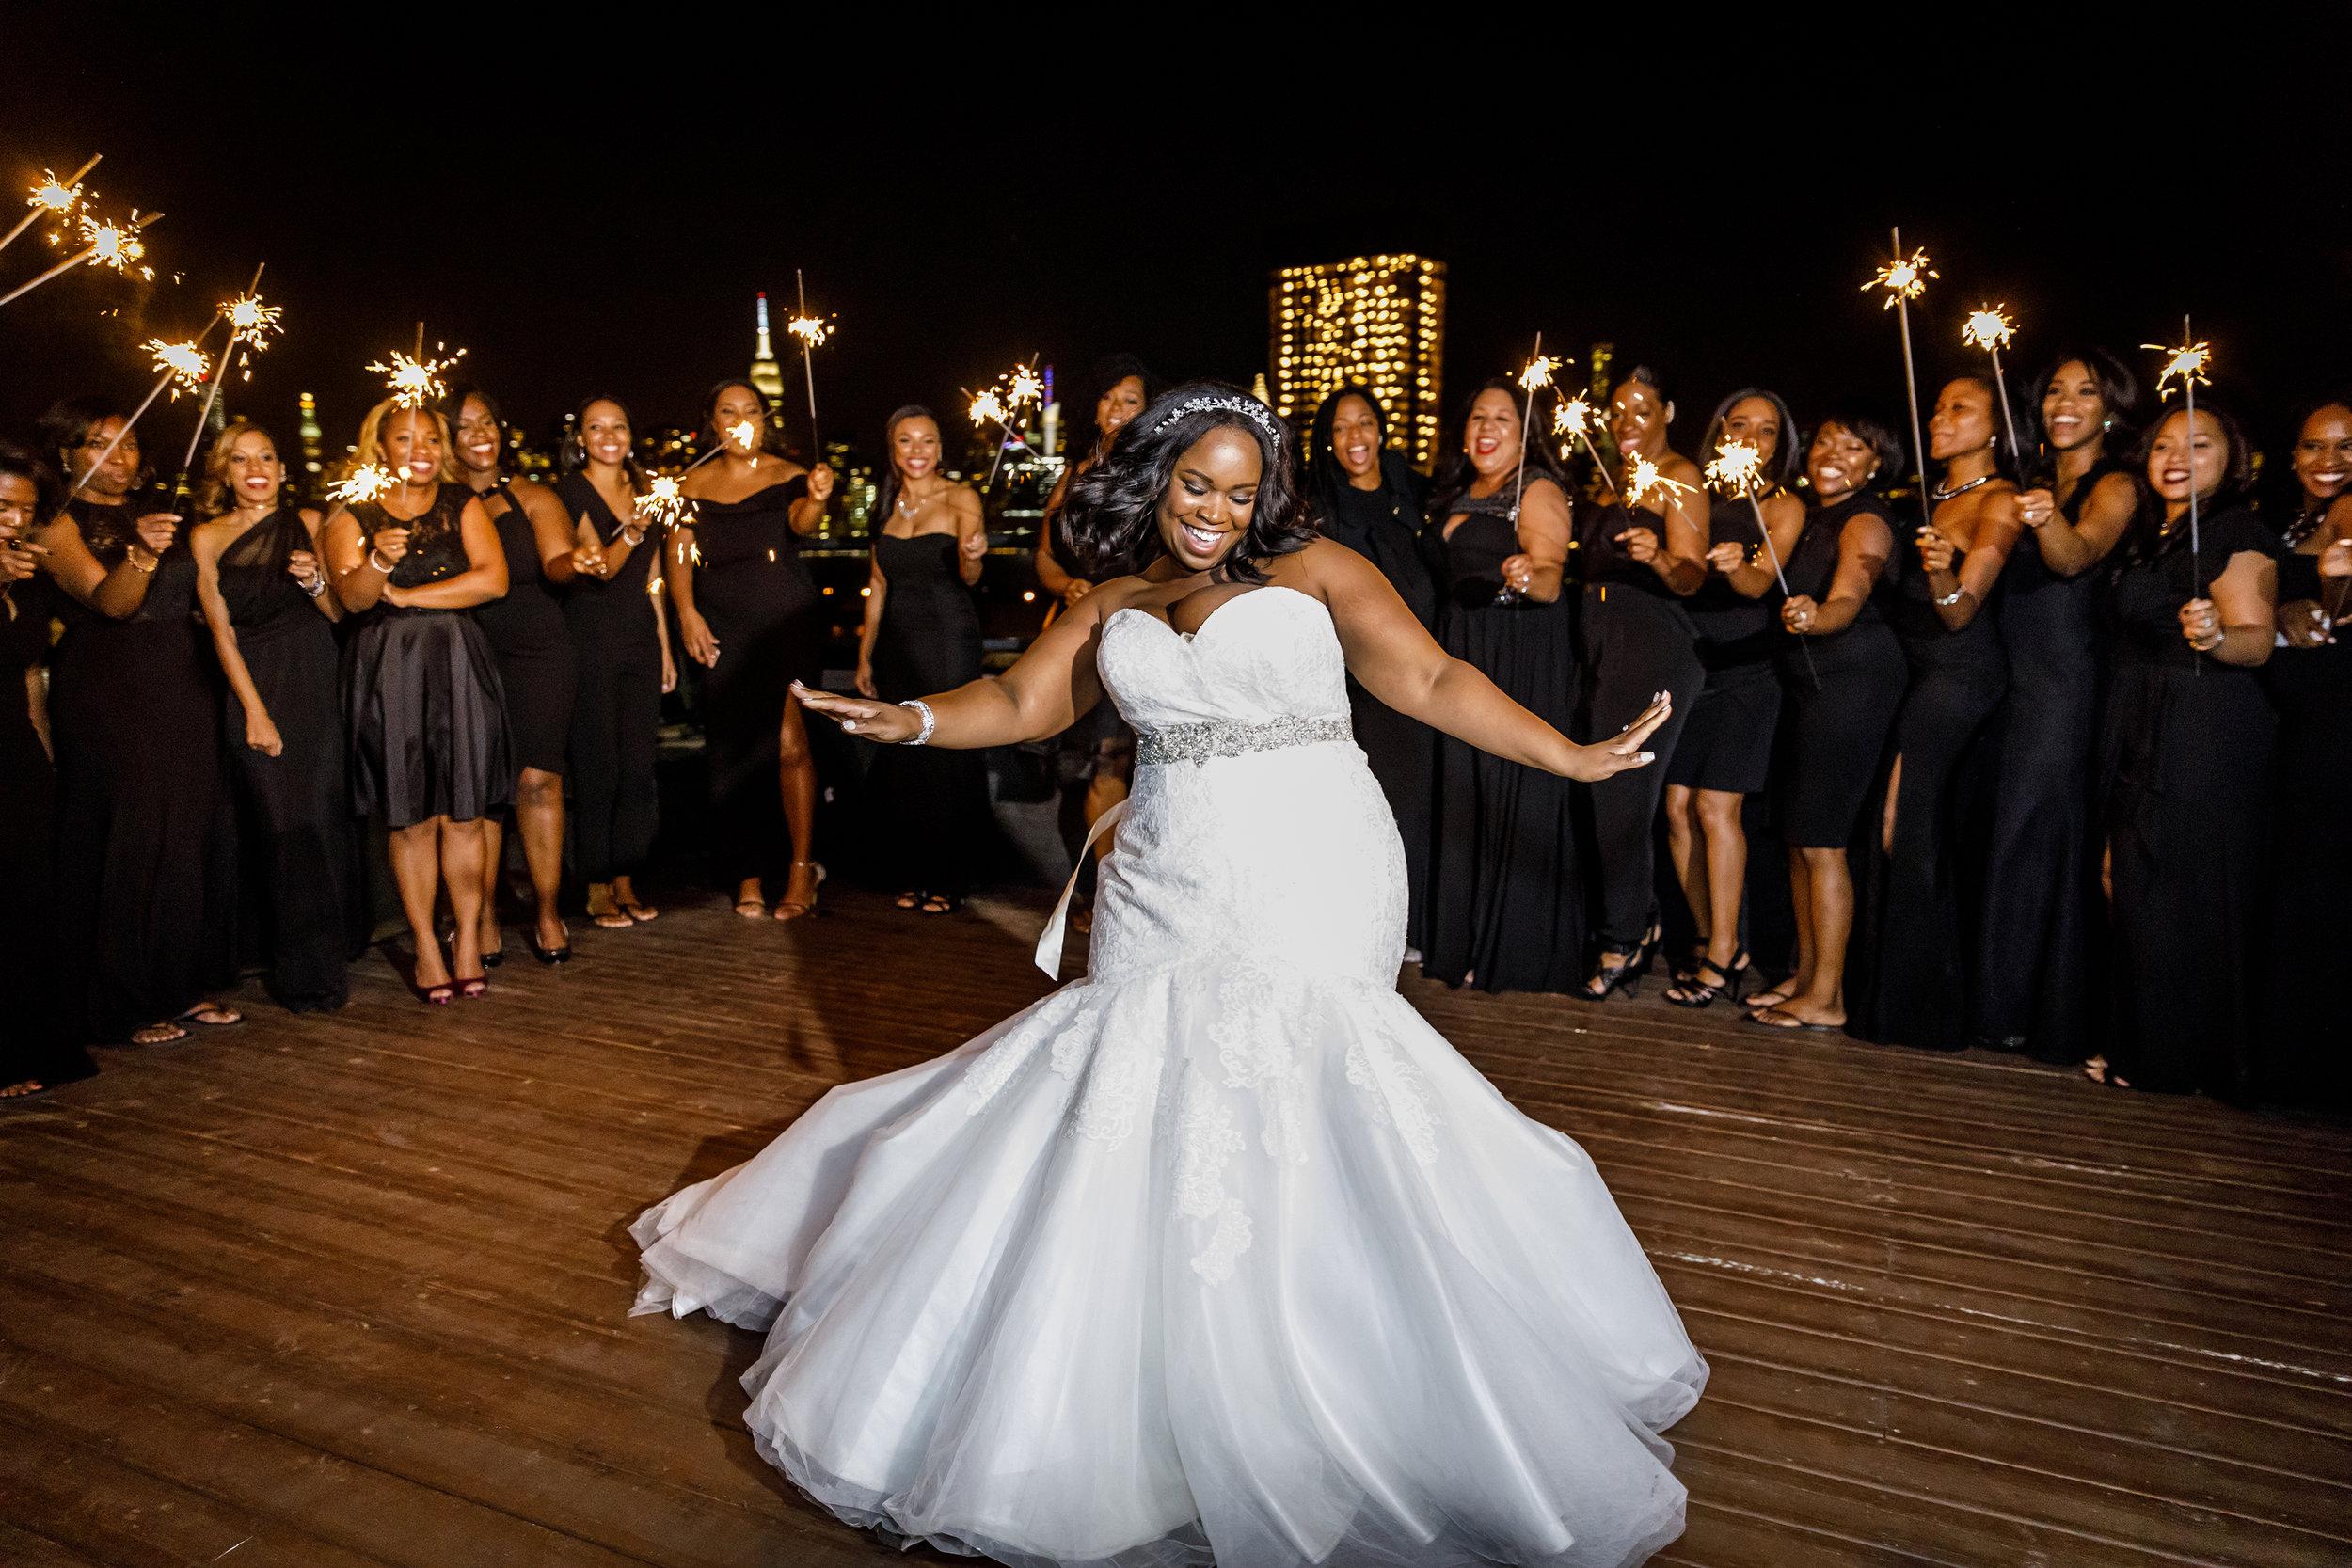 victorious-events-nyc-045-yanique-rondel-greenpoint-loft-wedding-amy-anaiz.jpg